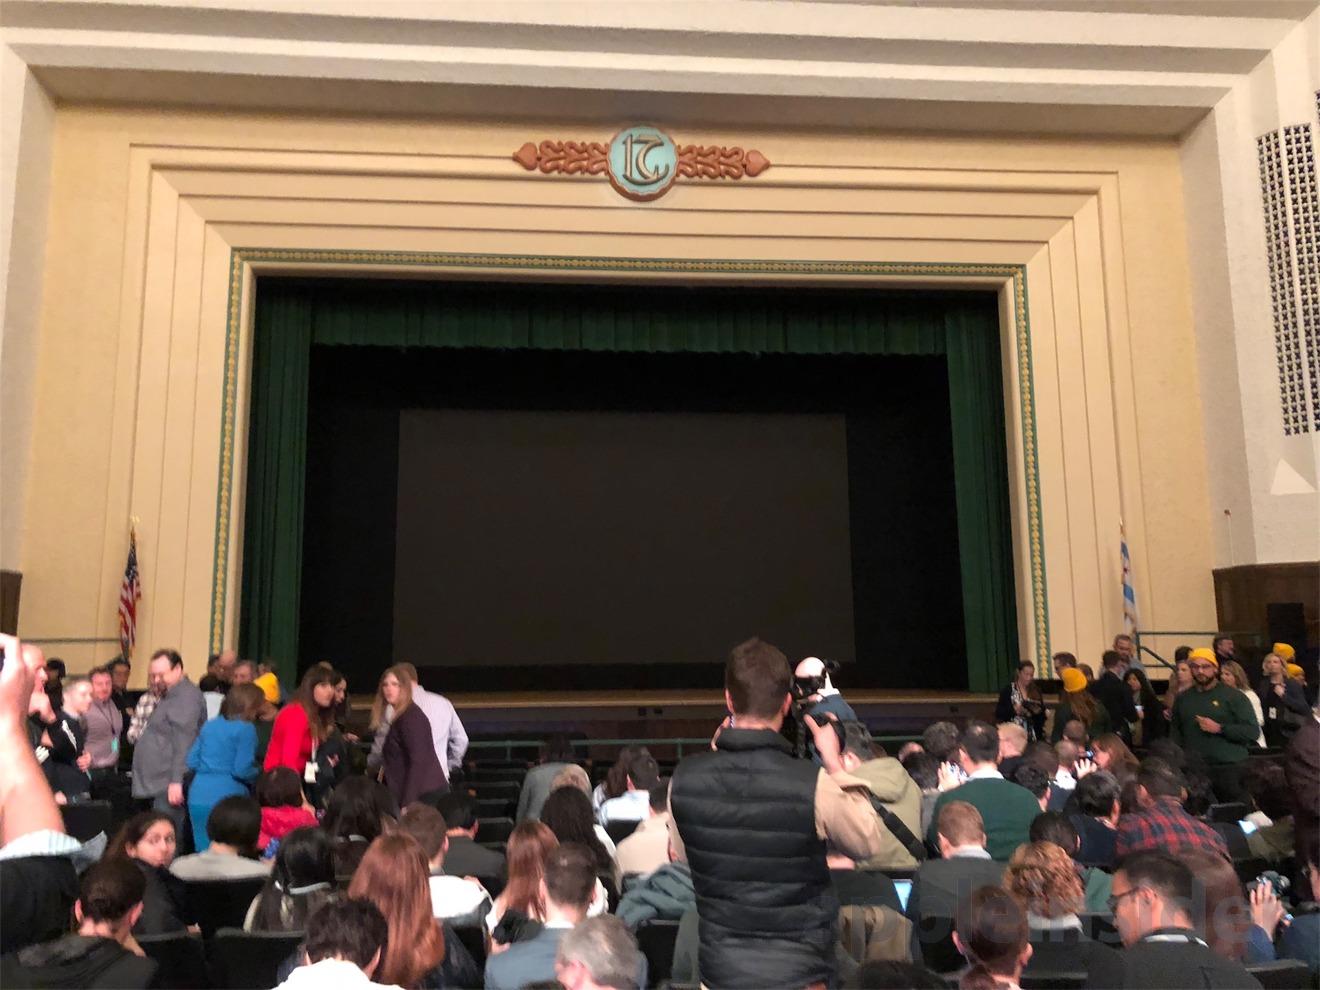 The auditorium at Lane Tech College Prep High School, Chicago IL.